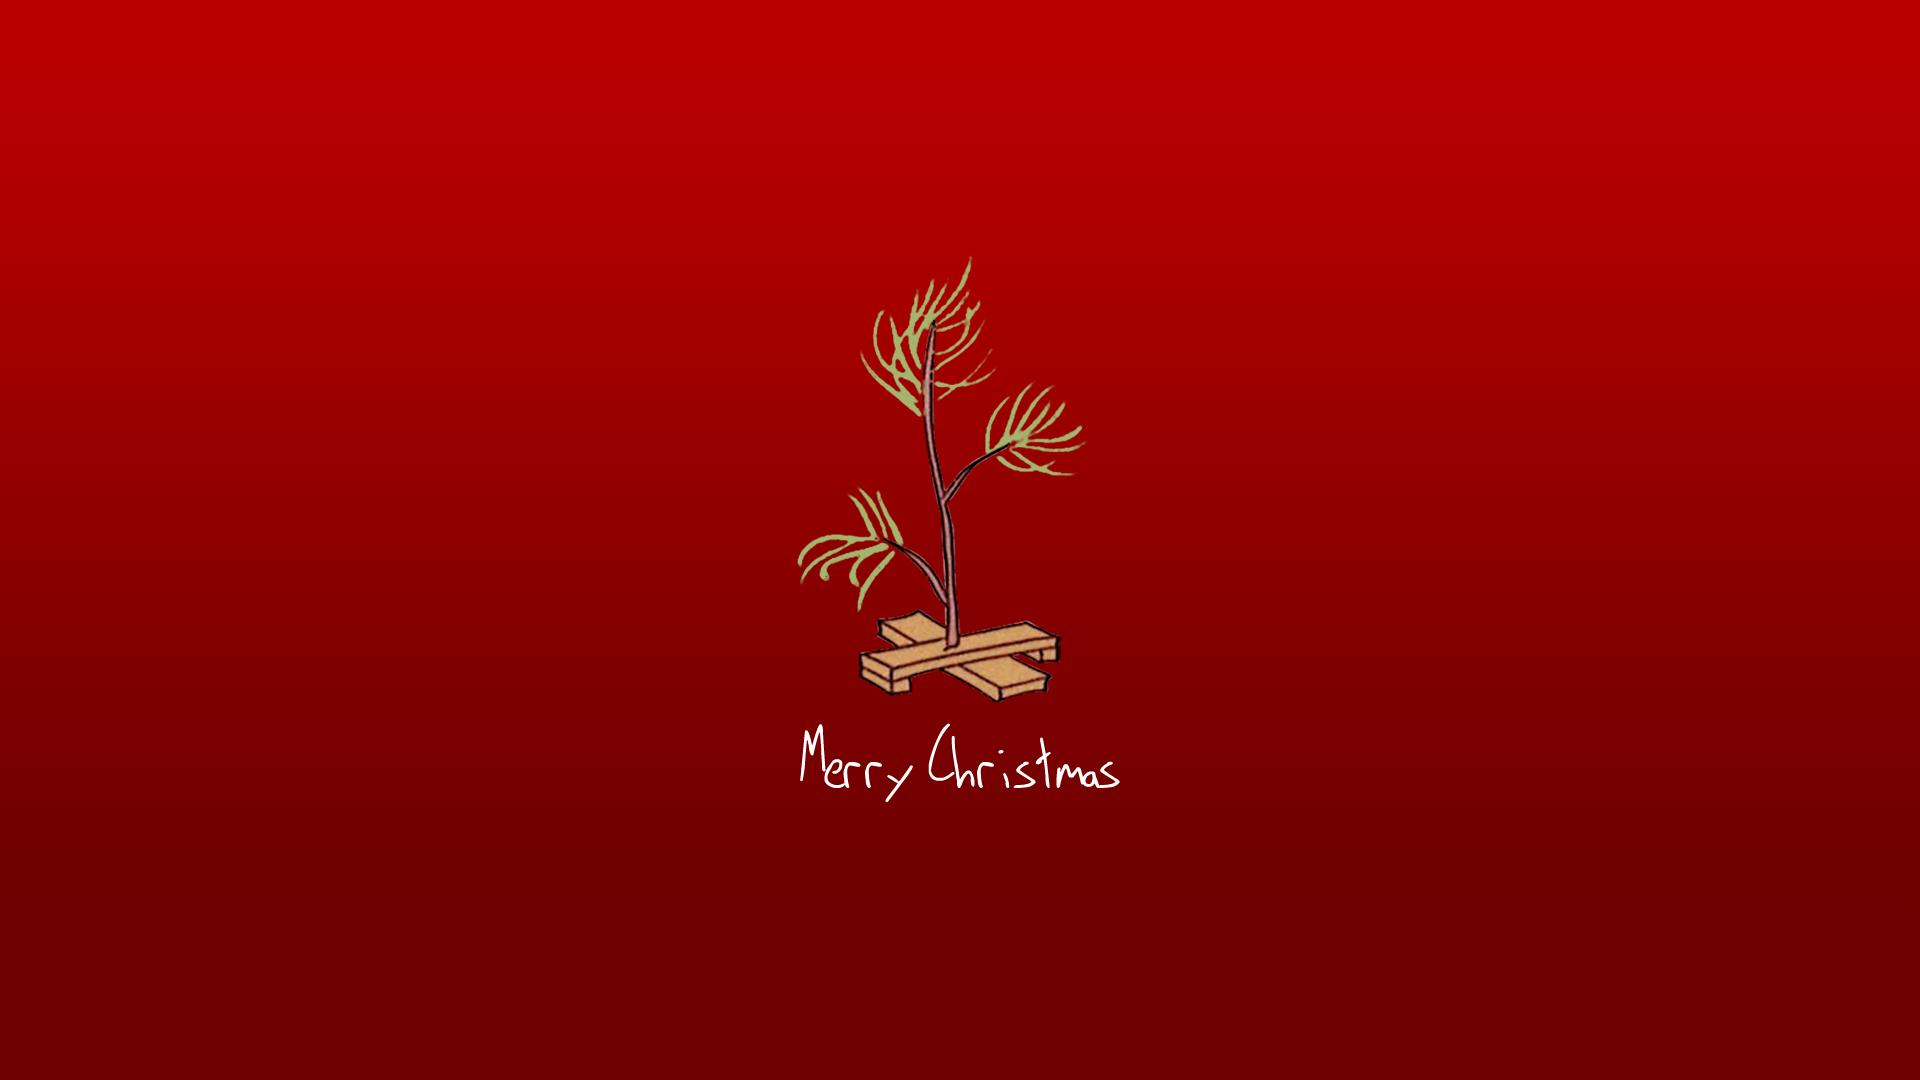 Minimal Christmas Wallpaper 338830 1920x1080